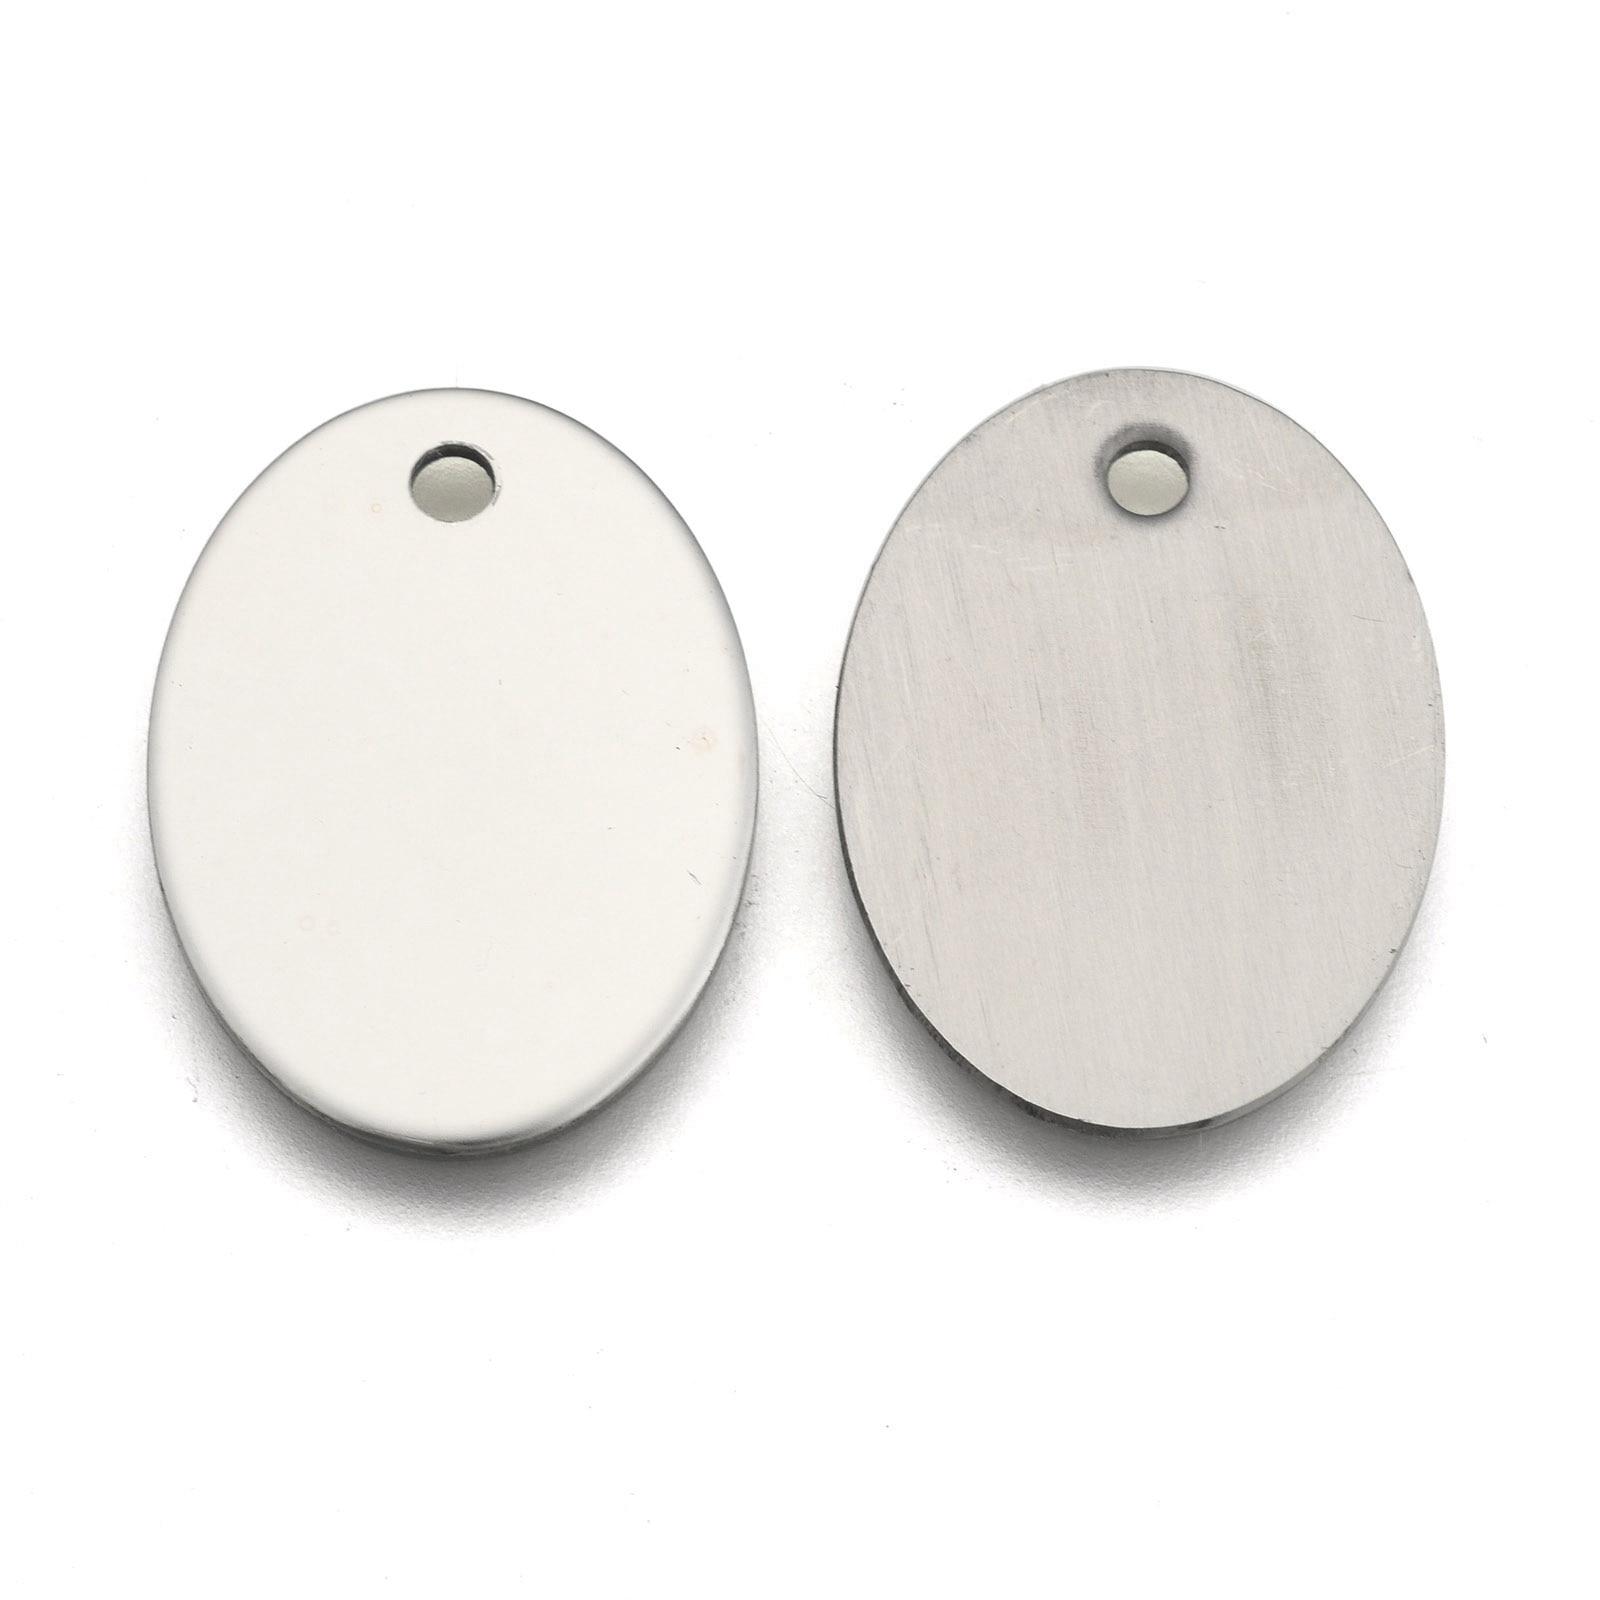 Rectangle stamping Blanc Or Acier Inoxydable 24x43mm afindings À faire soi-même Bijoux